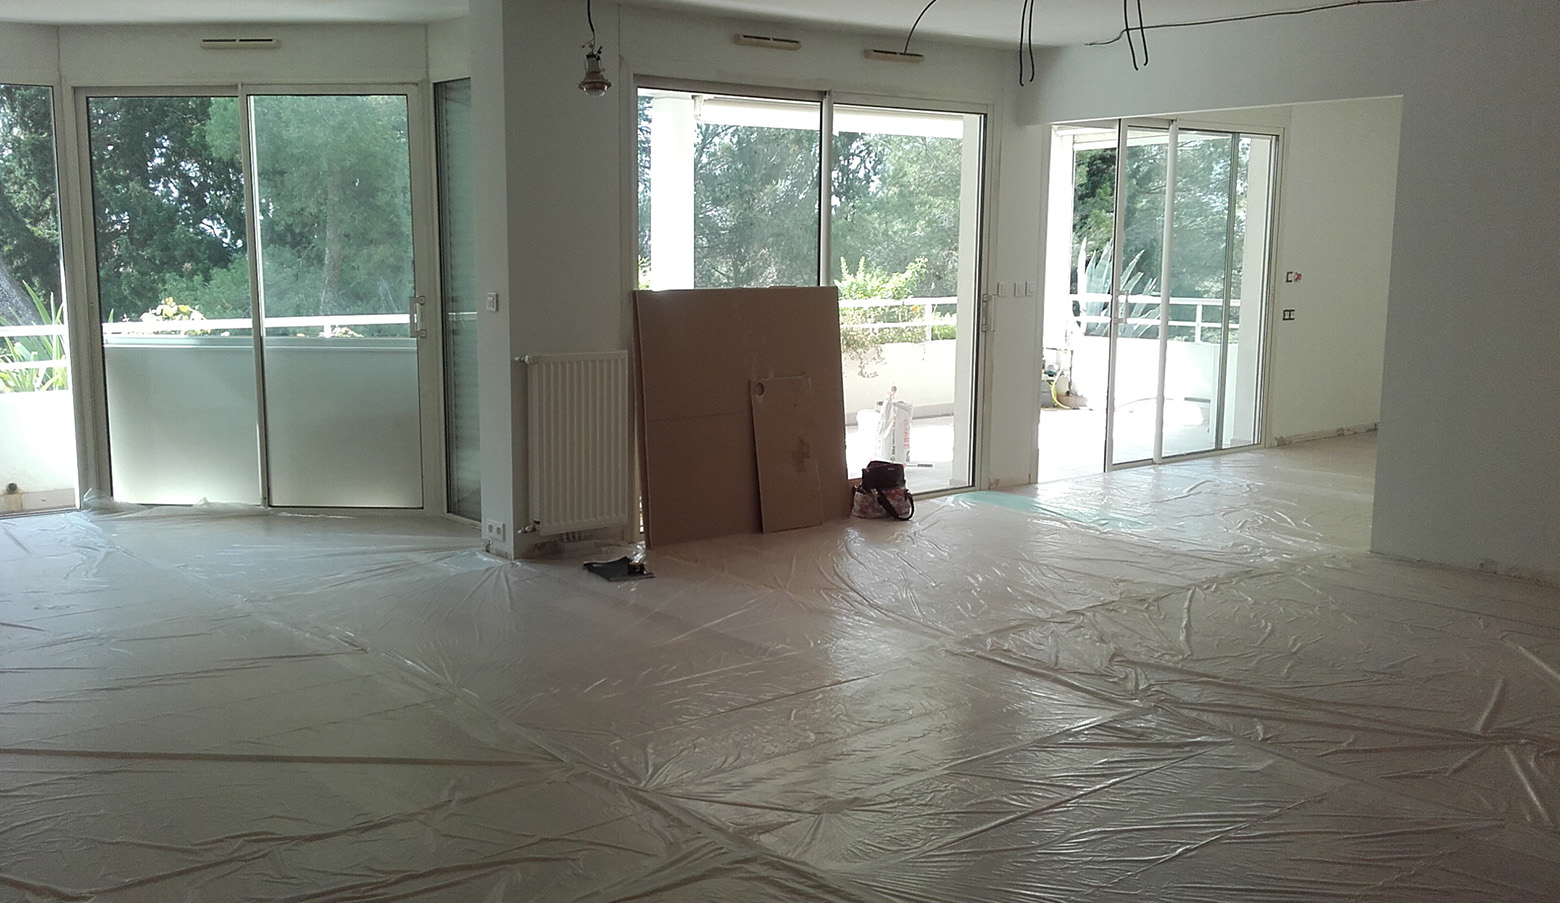 am nagement de l appartement v r lhenry c t d co. Black Bedroom Furniture Sets. Home Design Ideas